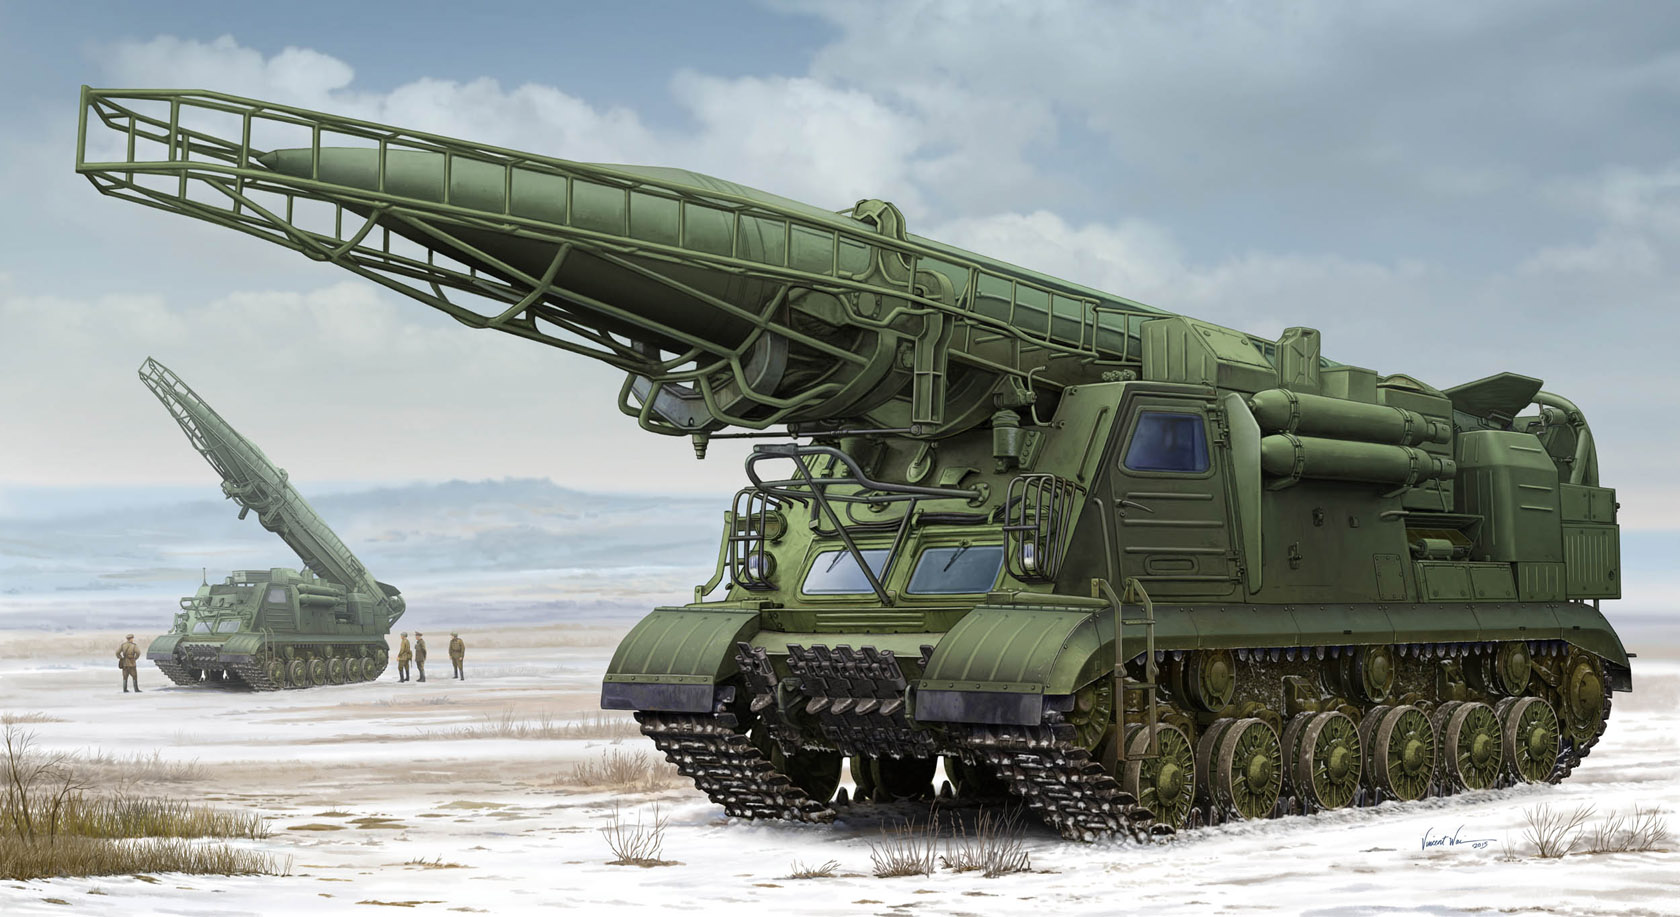 рисунок 2P19 w/R-17 Missile of 8K14